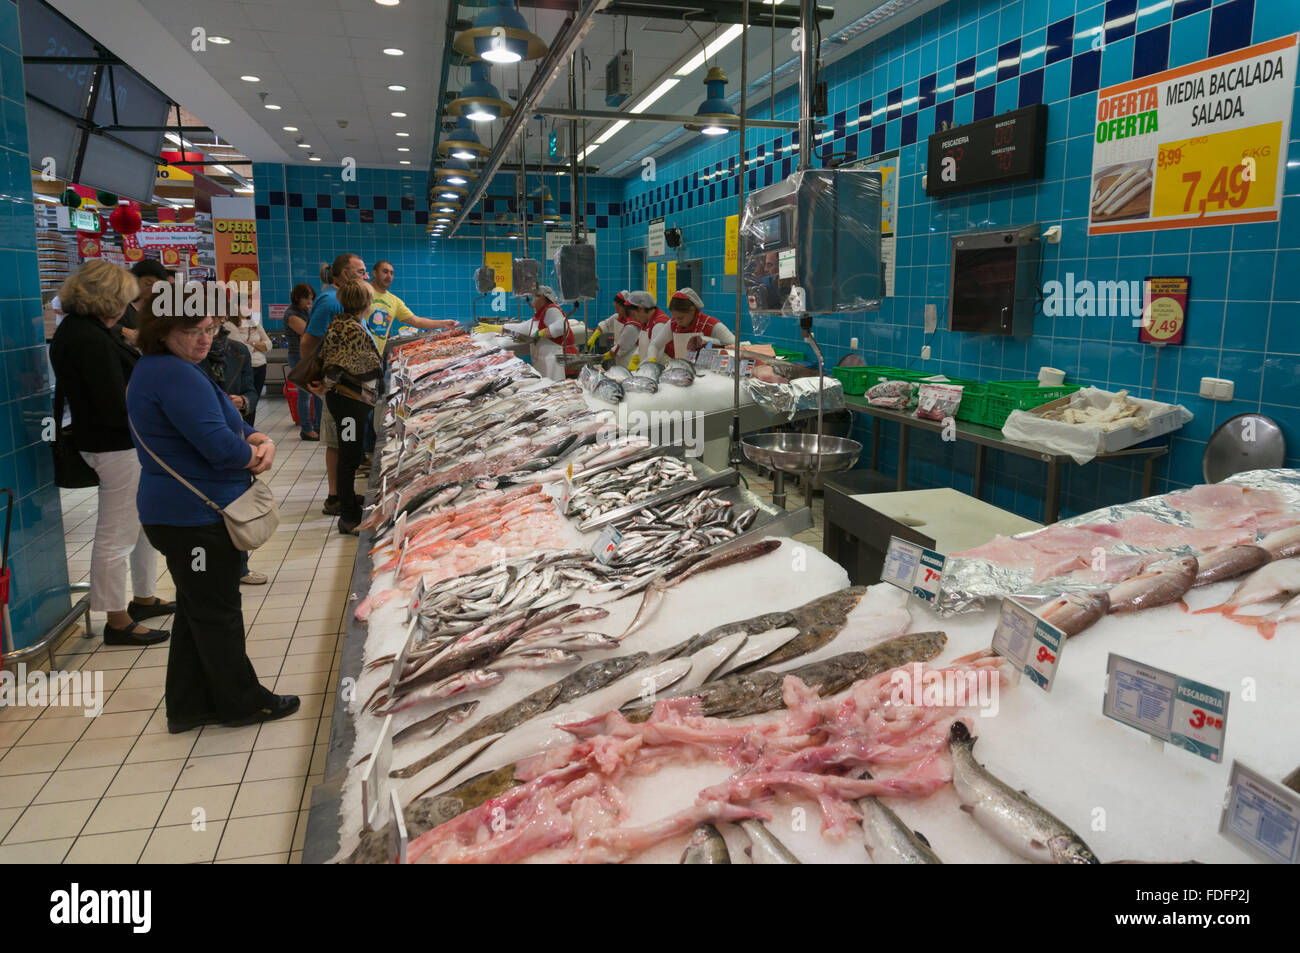 Marbella, Costa del Sol, Malaga Province, Andalusia, southern Spain.   Fish and seafood counter at Al Campo supermarket - Stock Image